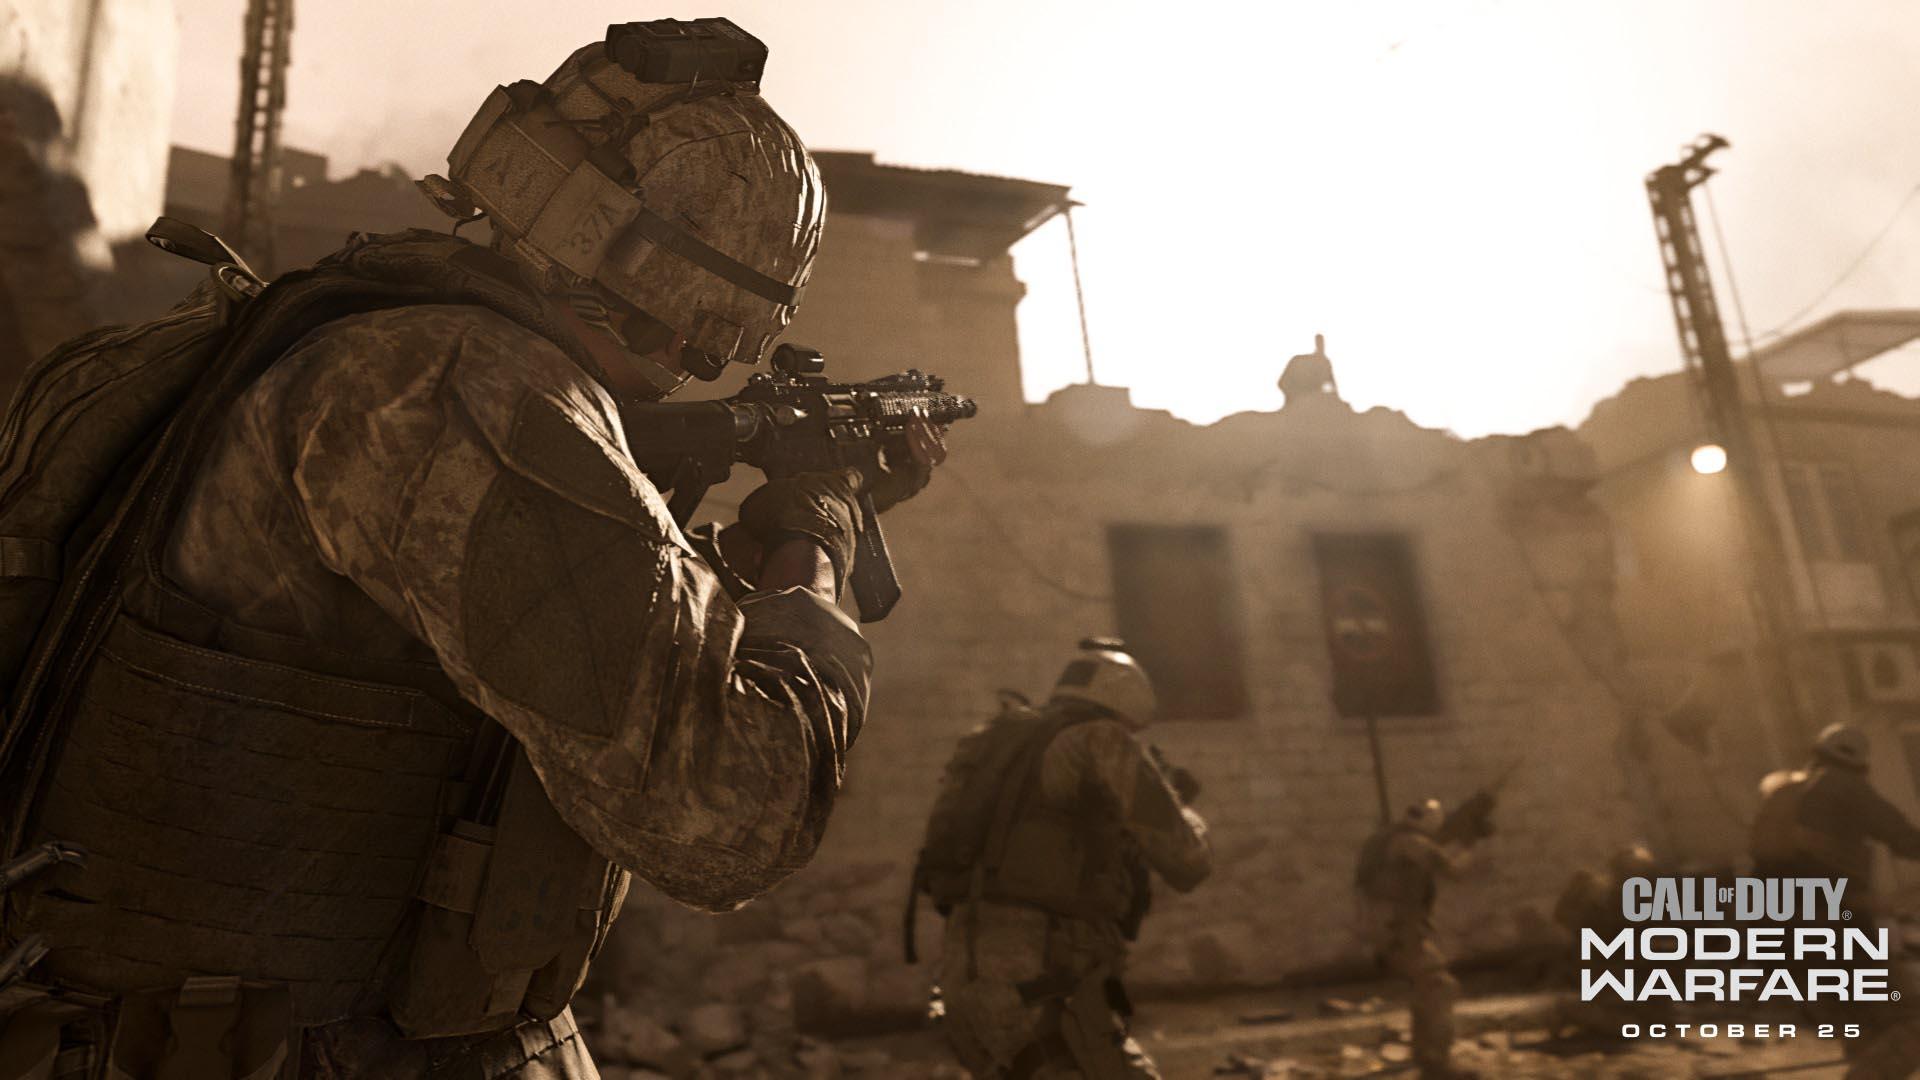 inifnity ward call of duty modern warfare launch trailer